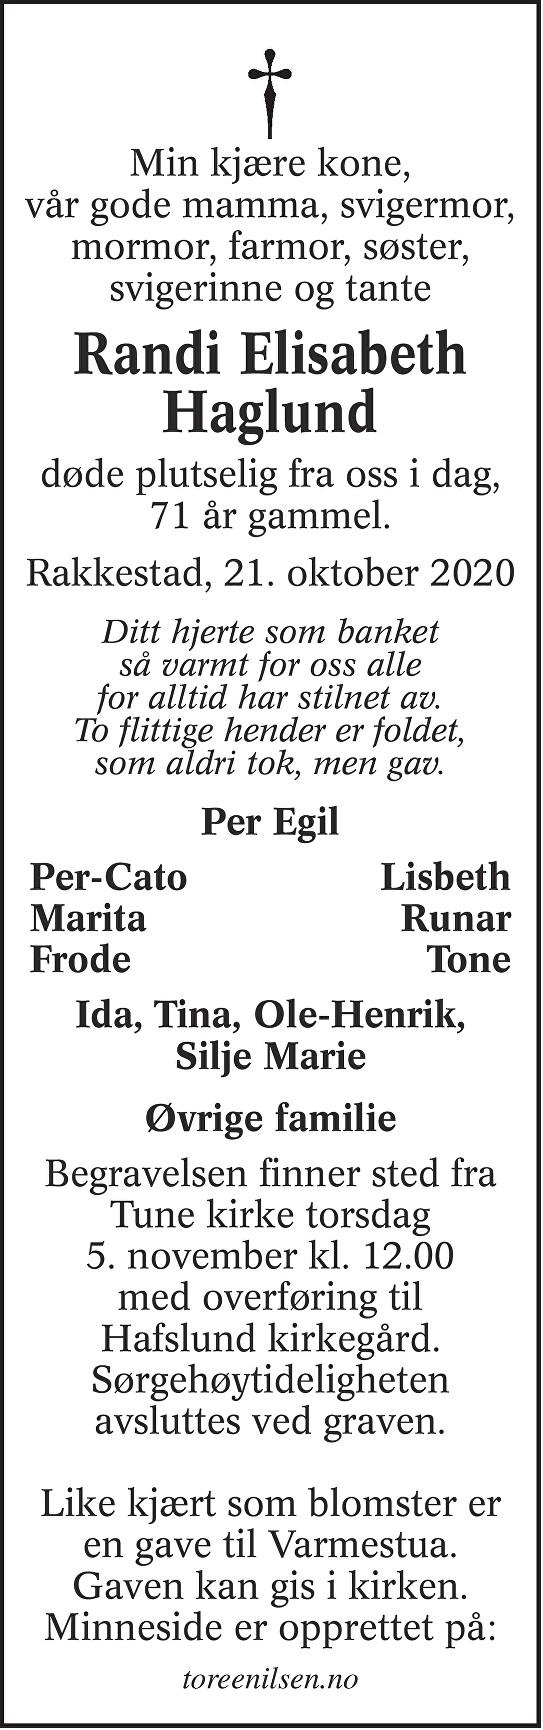 Randi Elisabeth Haglund Dødsannonse